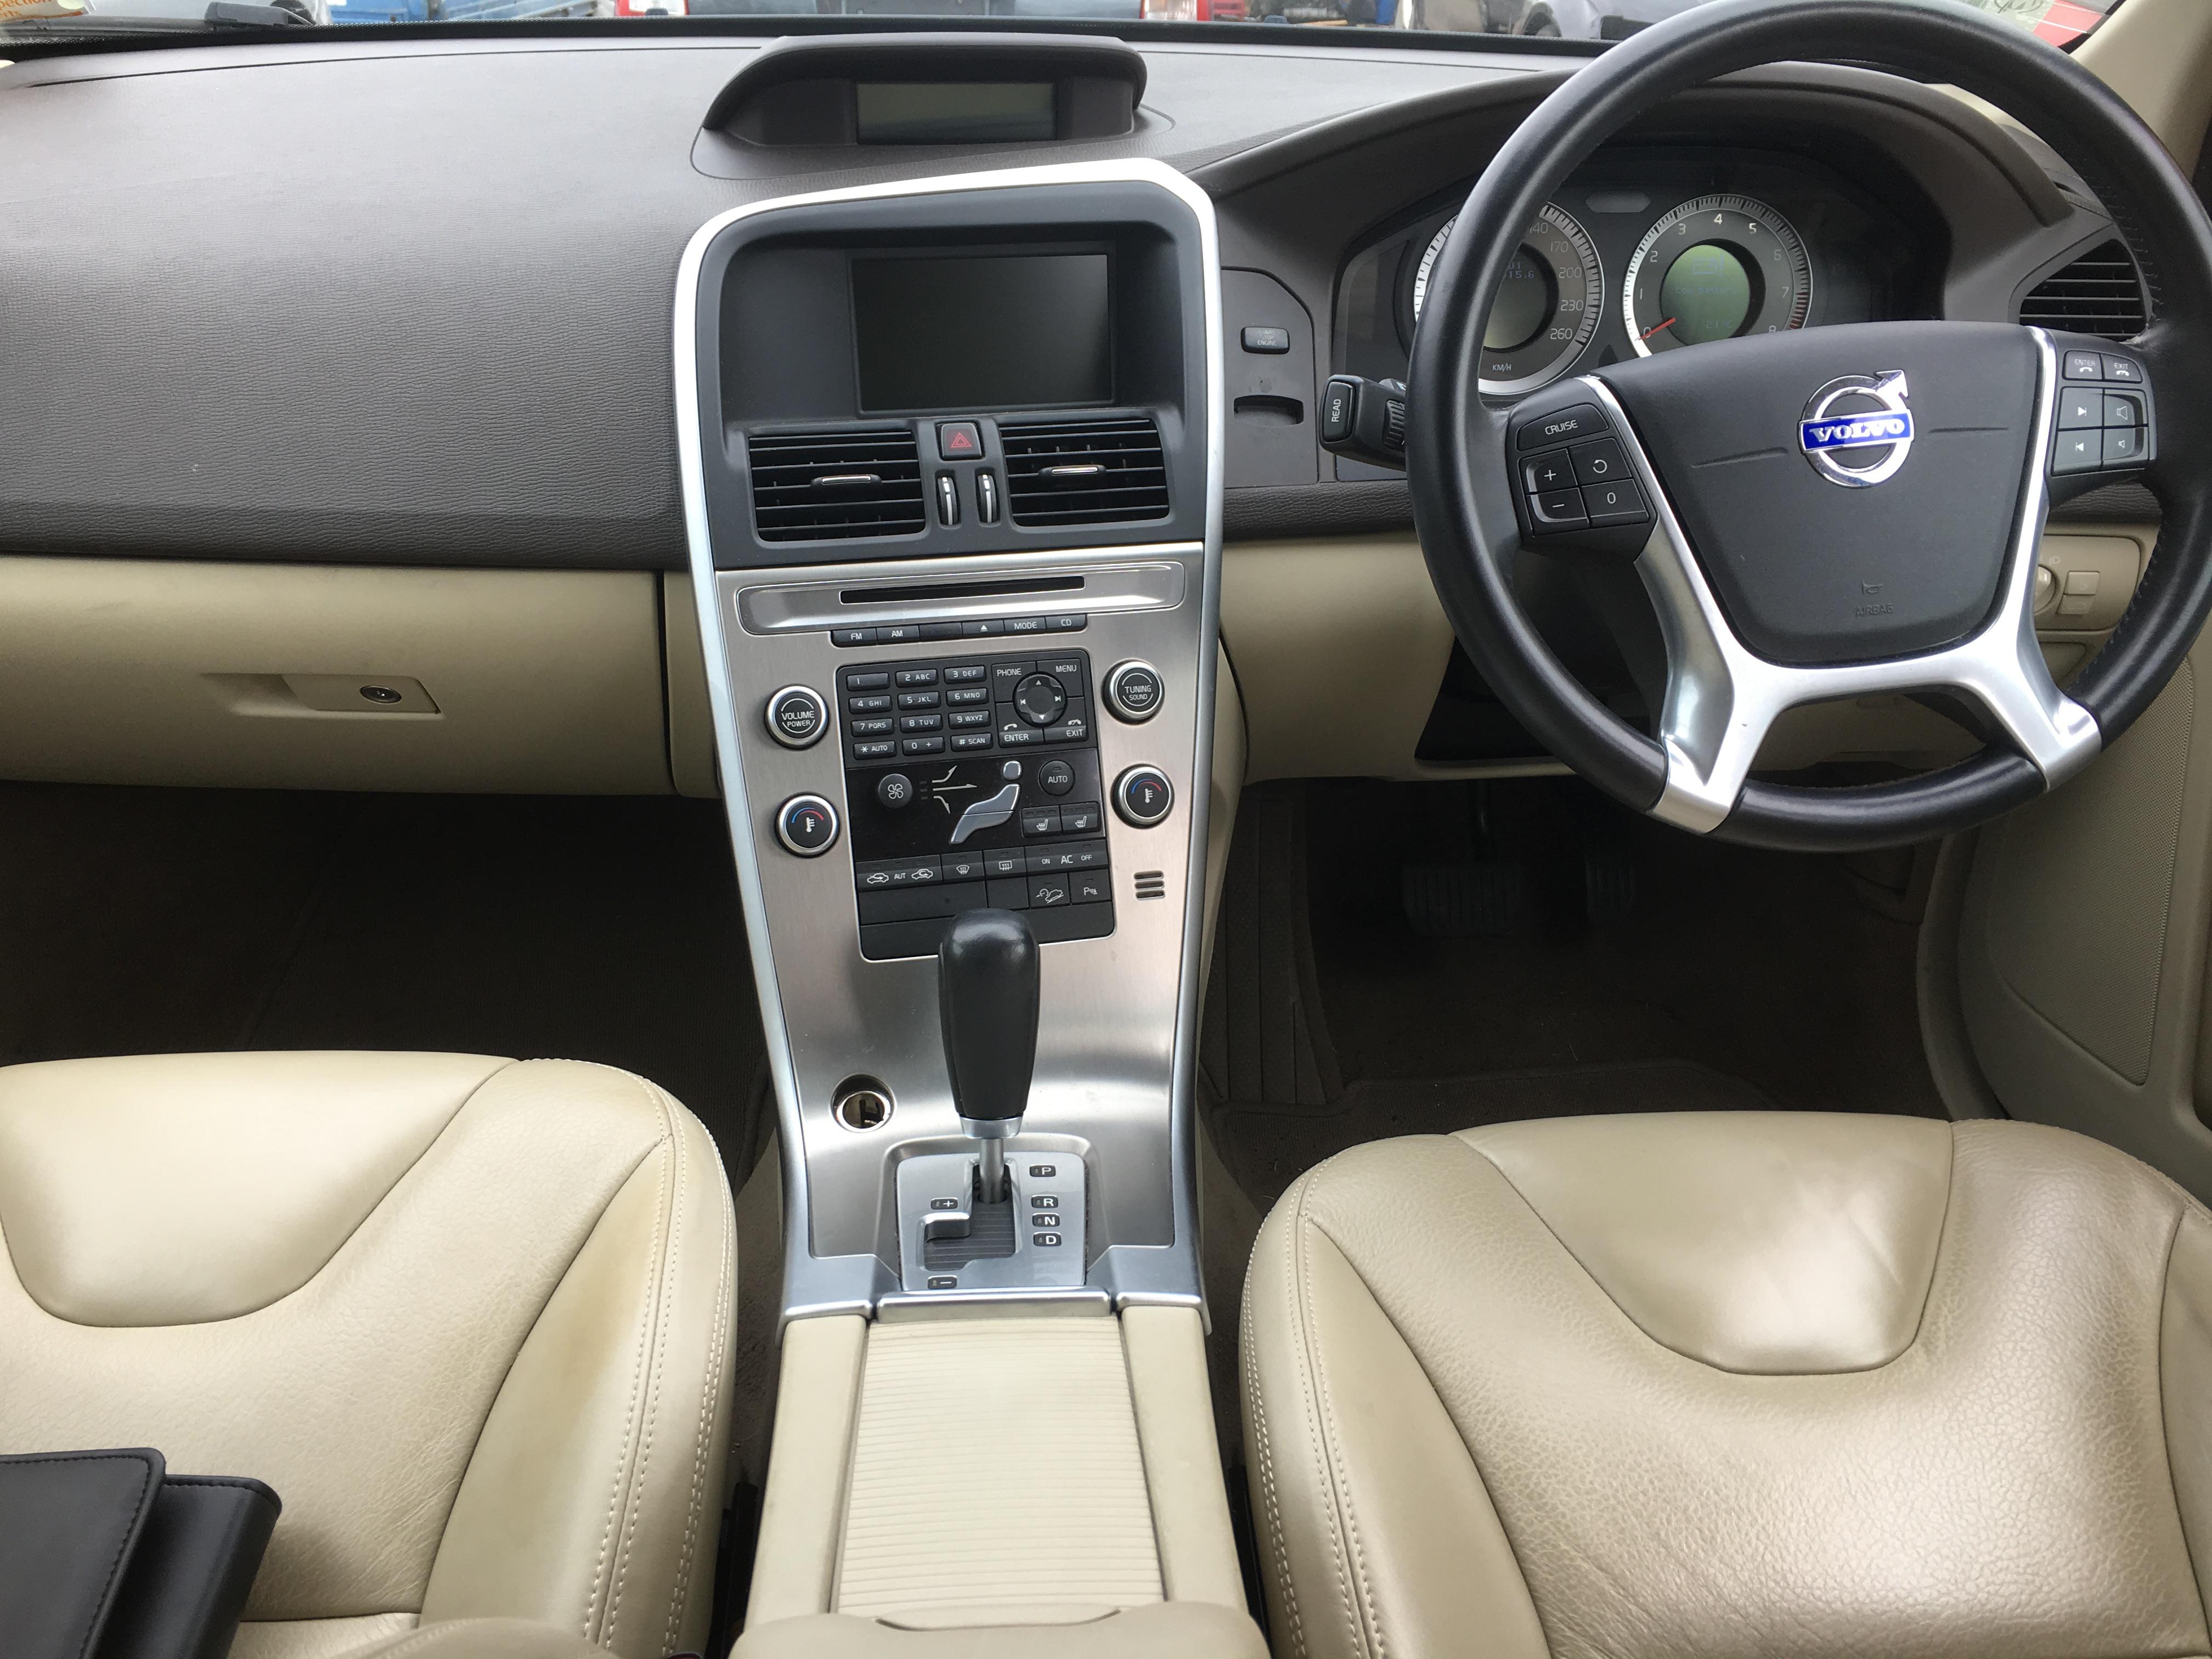 volvo xc60 2010 car parts